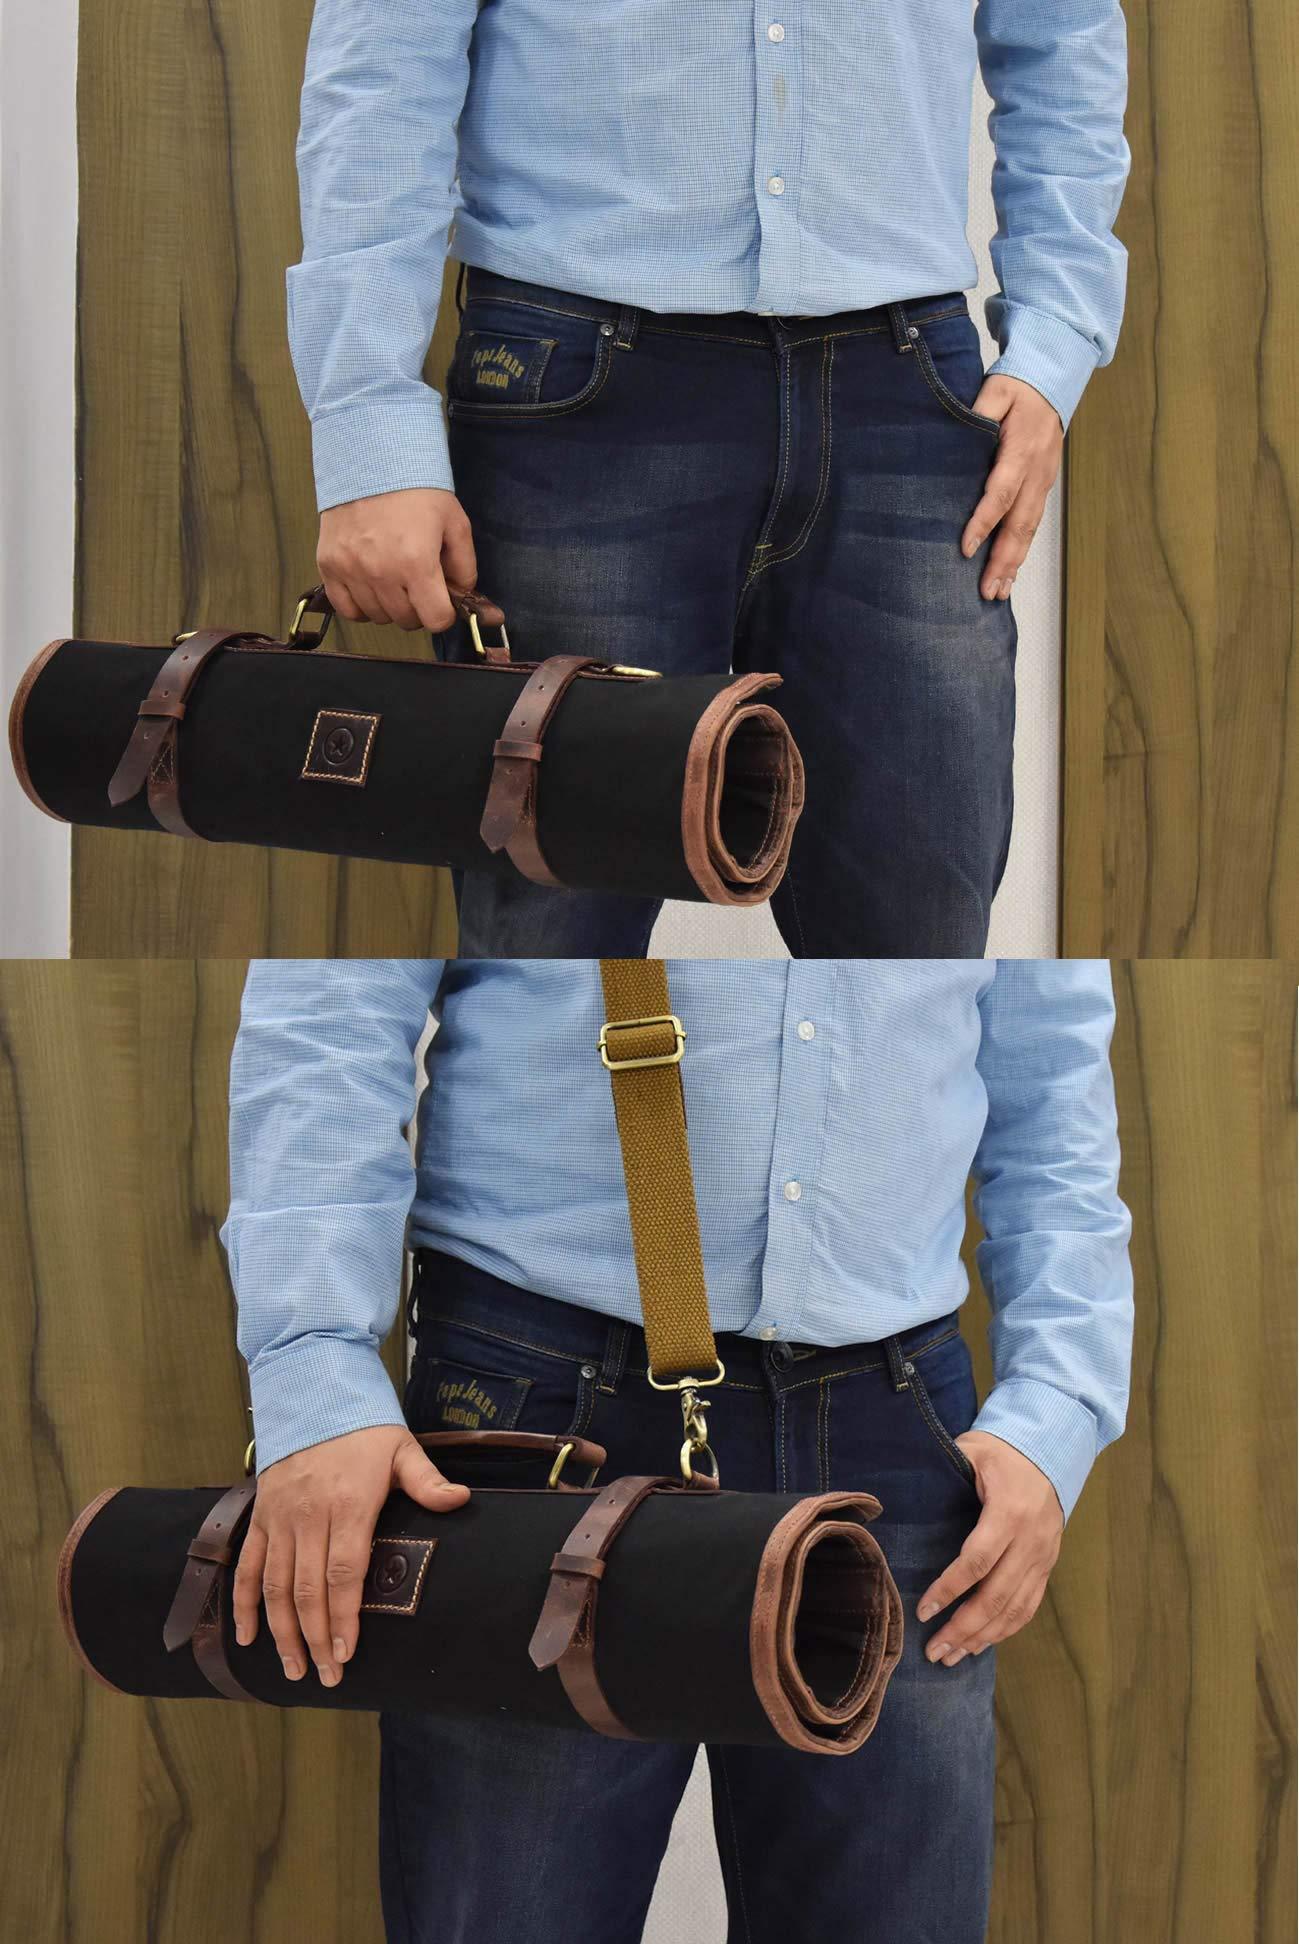 Leather Knife Roll Storage Bag   Elastic and Expandable 10 Pockets   Adjustable/Detachable Shoulder Strap   Travel-Friendly Chef Knife Case Roll By Aaron Leather (Raven, Canvas) by AARON LEATHER GOODS VENDIMIA ESTILO (Image #7)